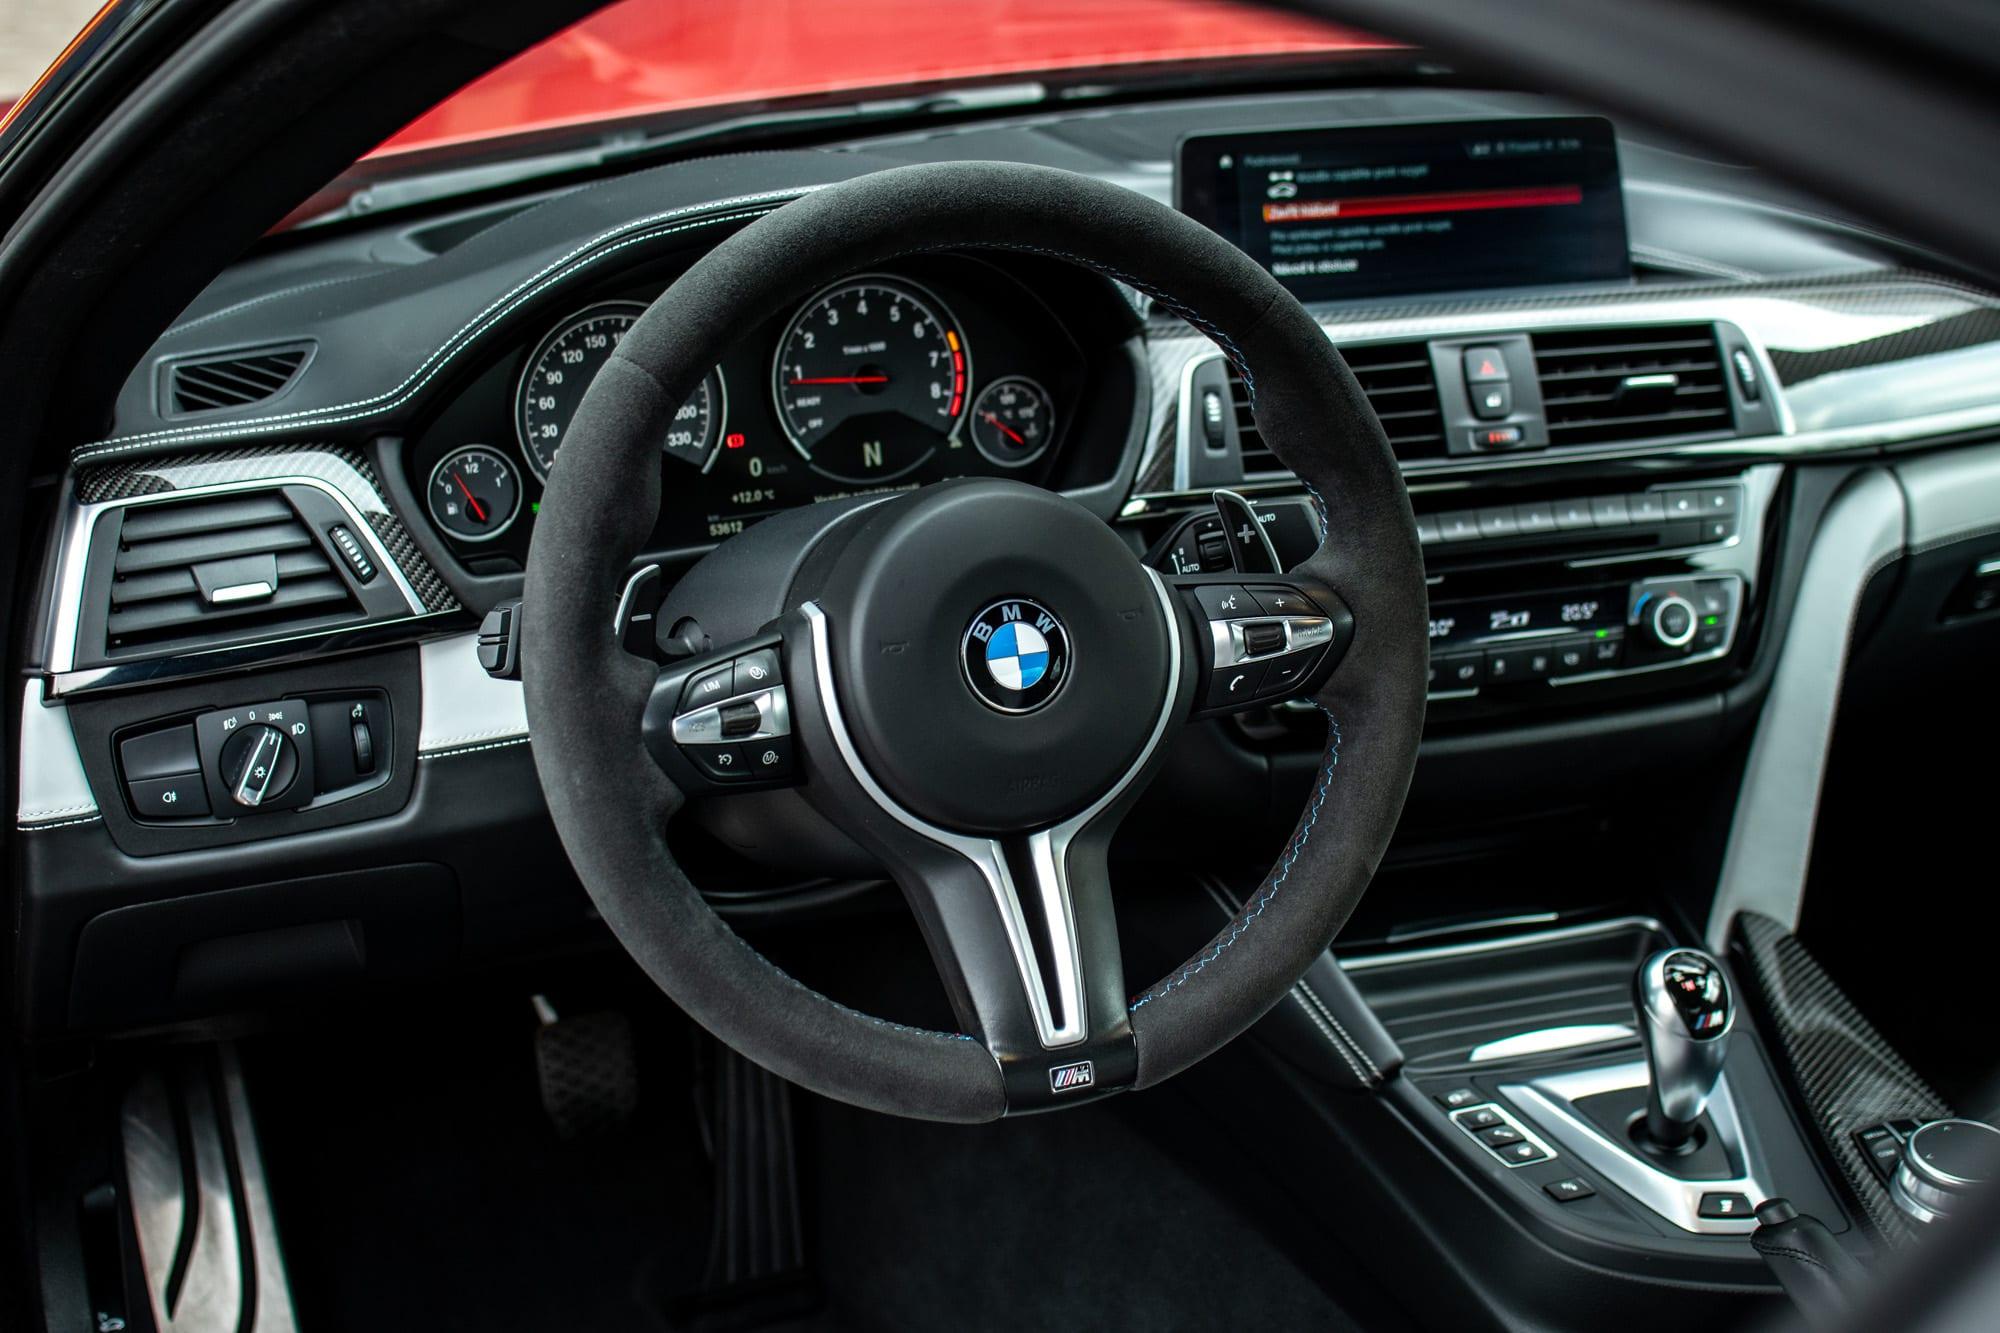 BMW M4 volant alcantara